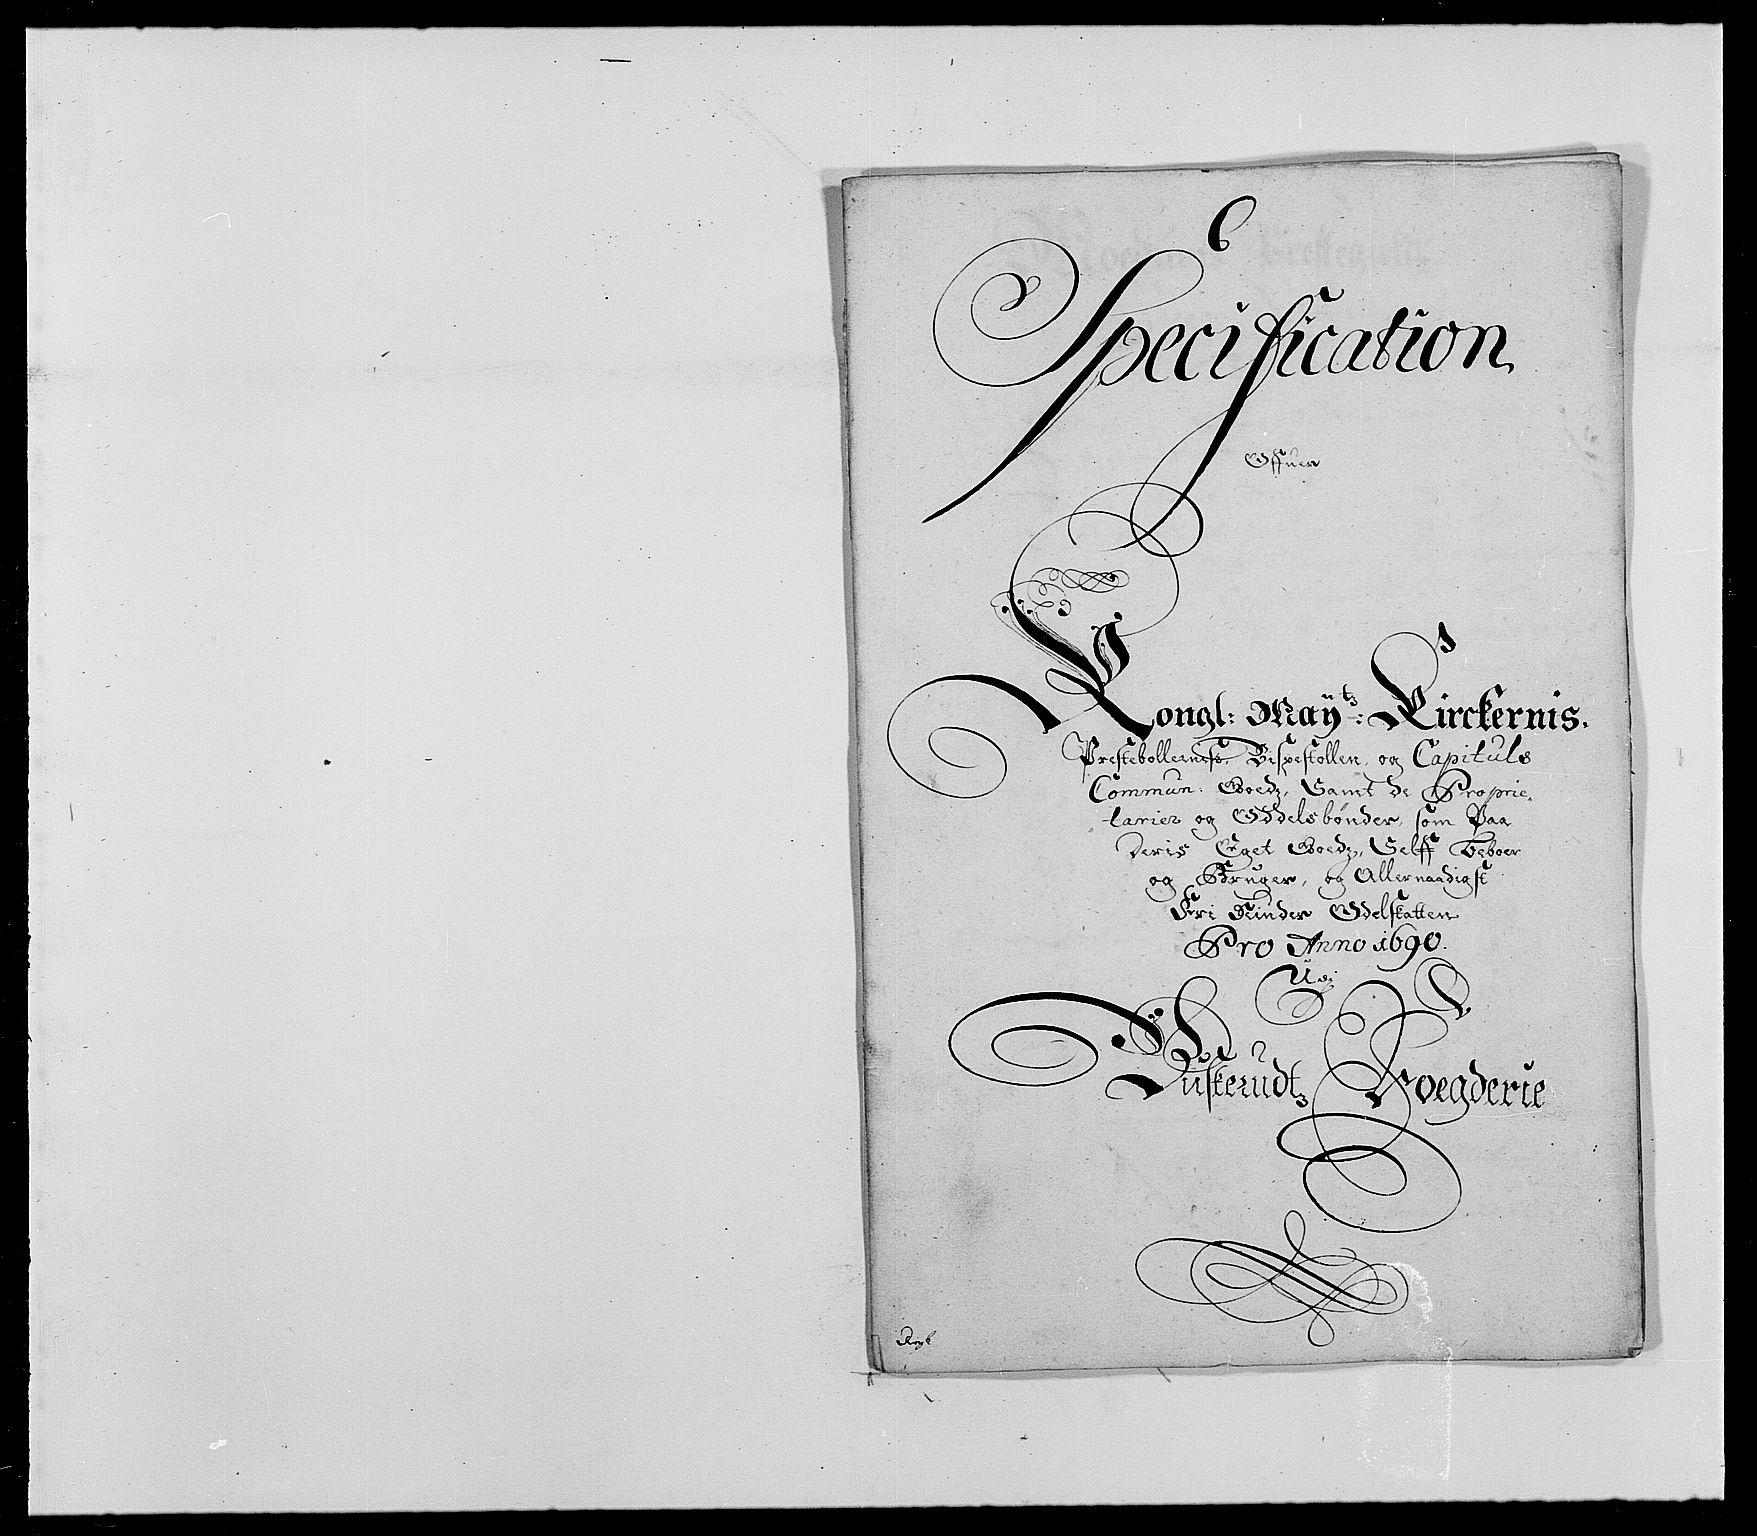 RA, Rentekammeret inntil 1814, Reviderte regnskaper, Fogderegnskap, R25/L1680: Fogderegnskap Buskerud, 1689-1690, s. 461